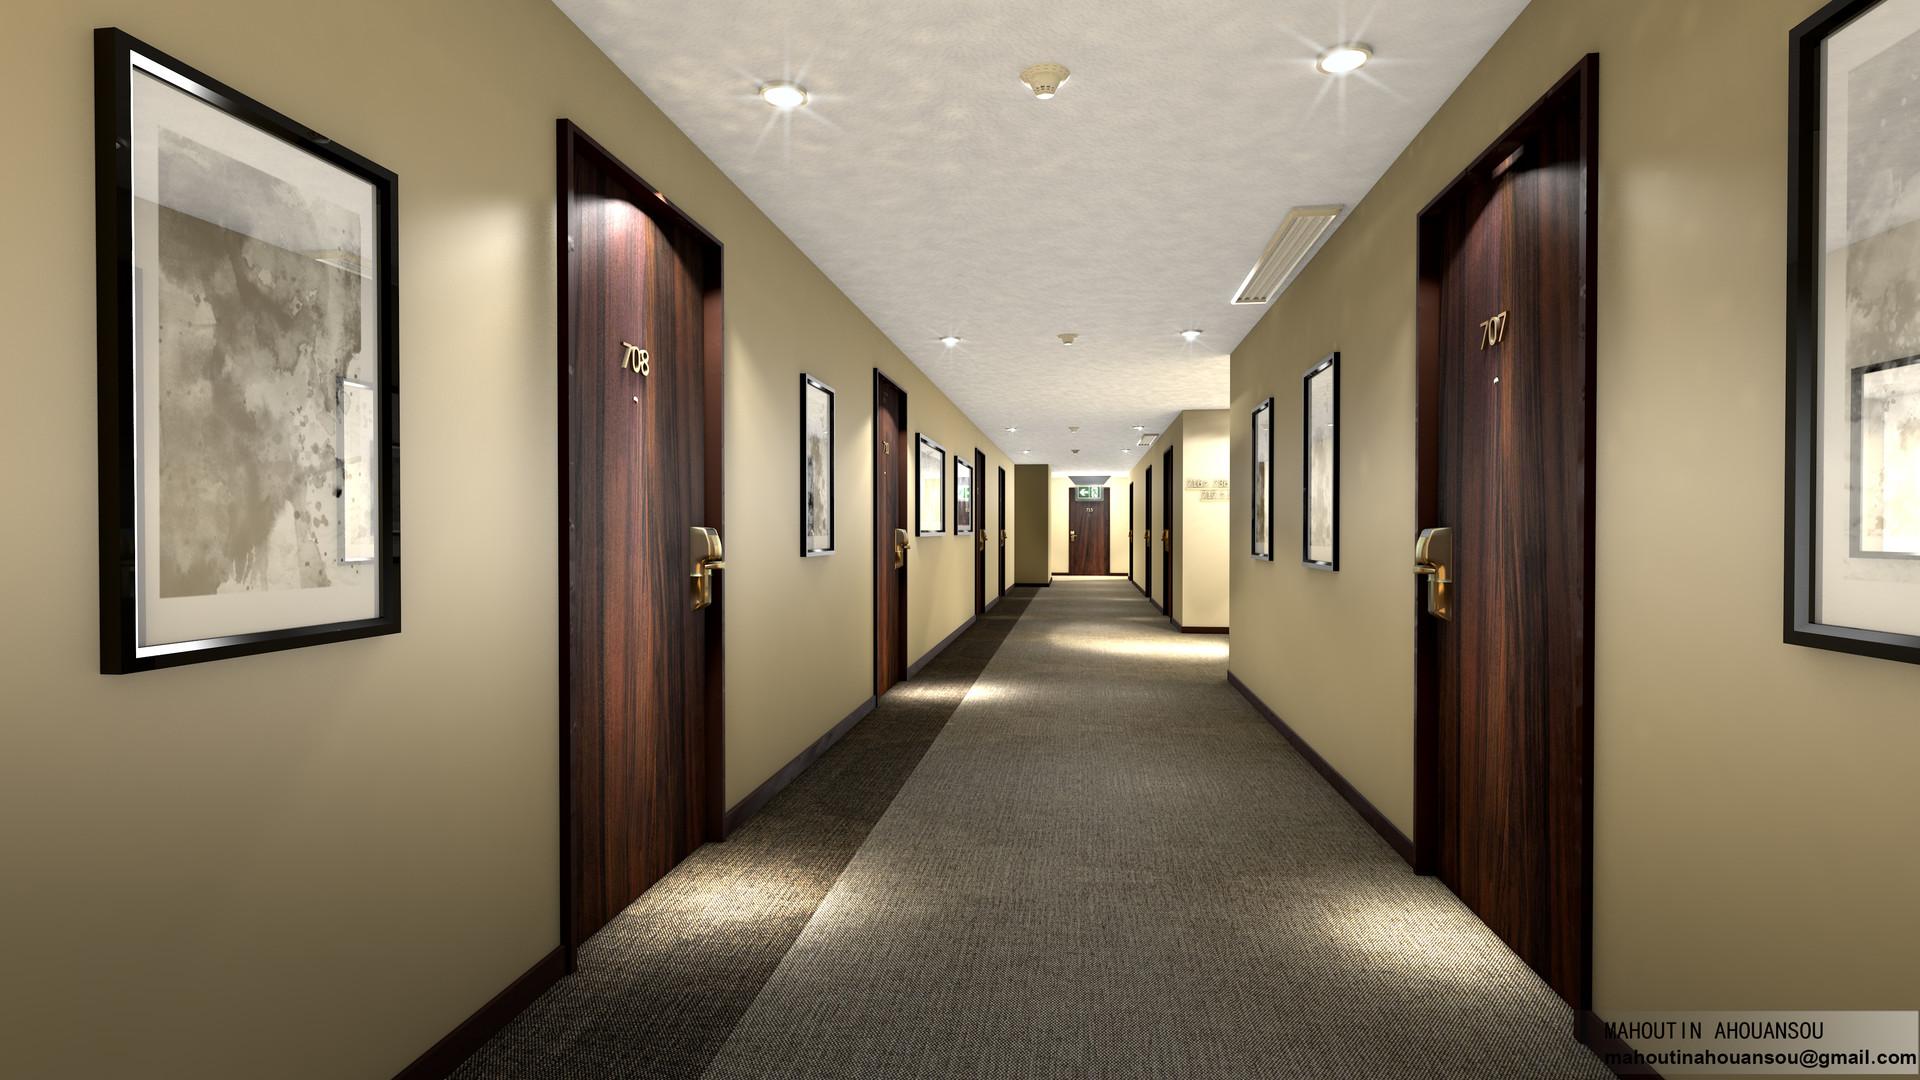 Modern Home Lighting Mahoutin Ahouansou Hotel Hallway